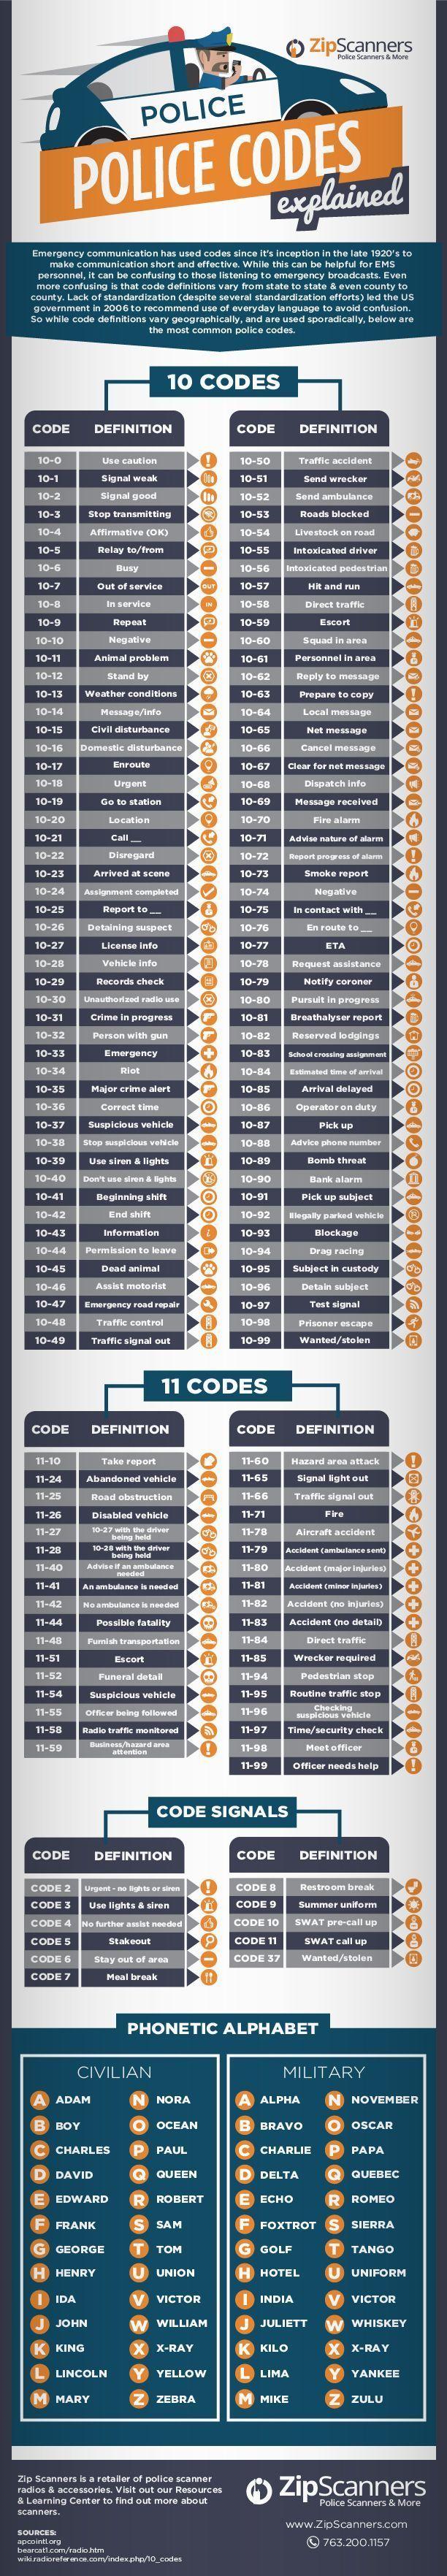 Police codes infographic #Survival #Preppers #PrepperBeginner